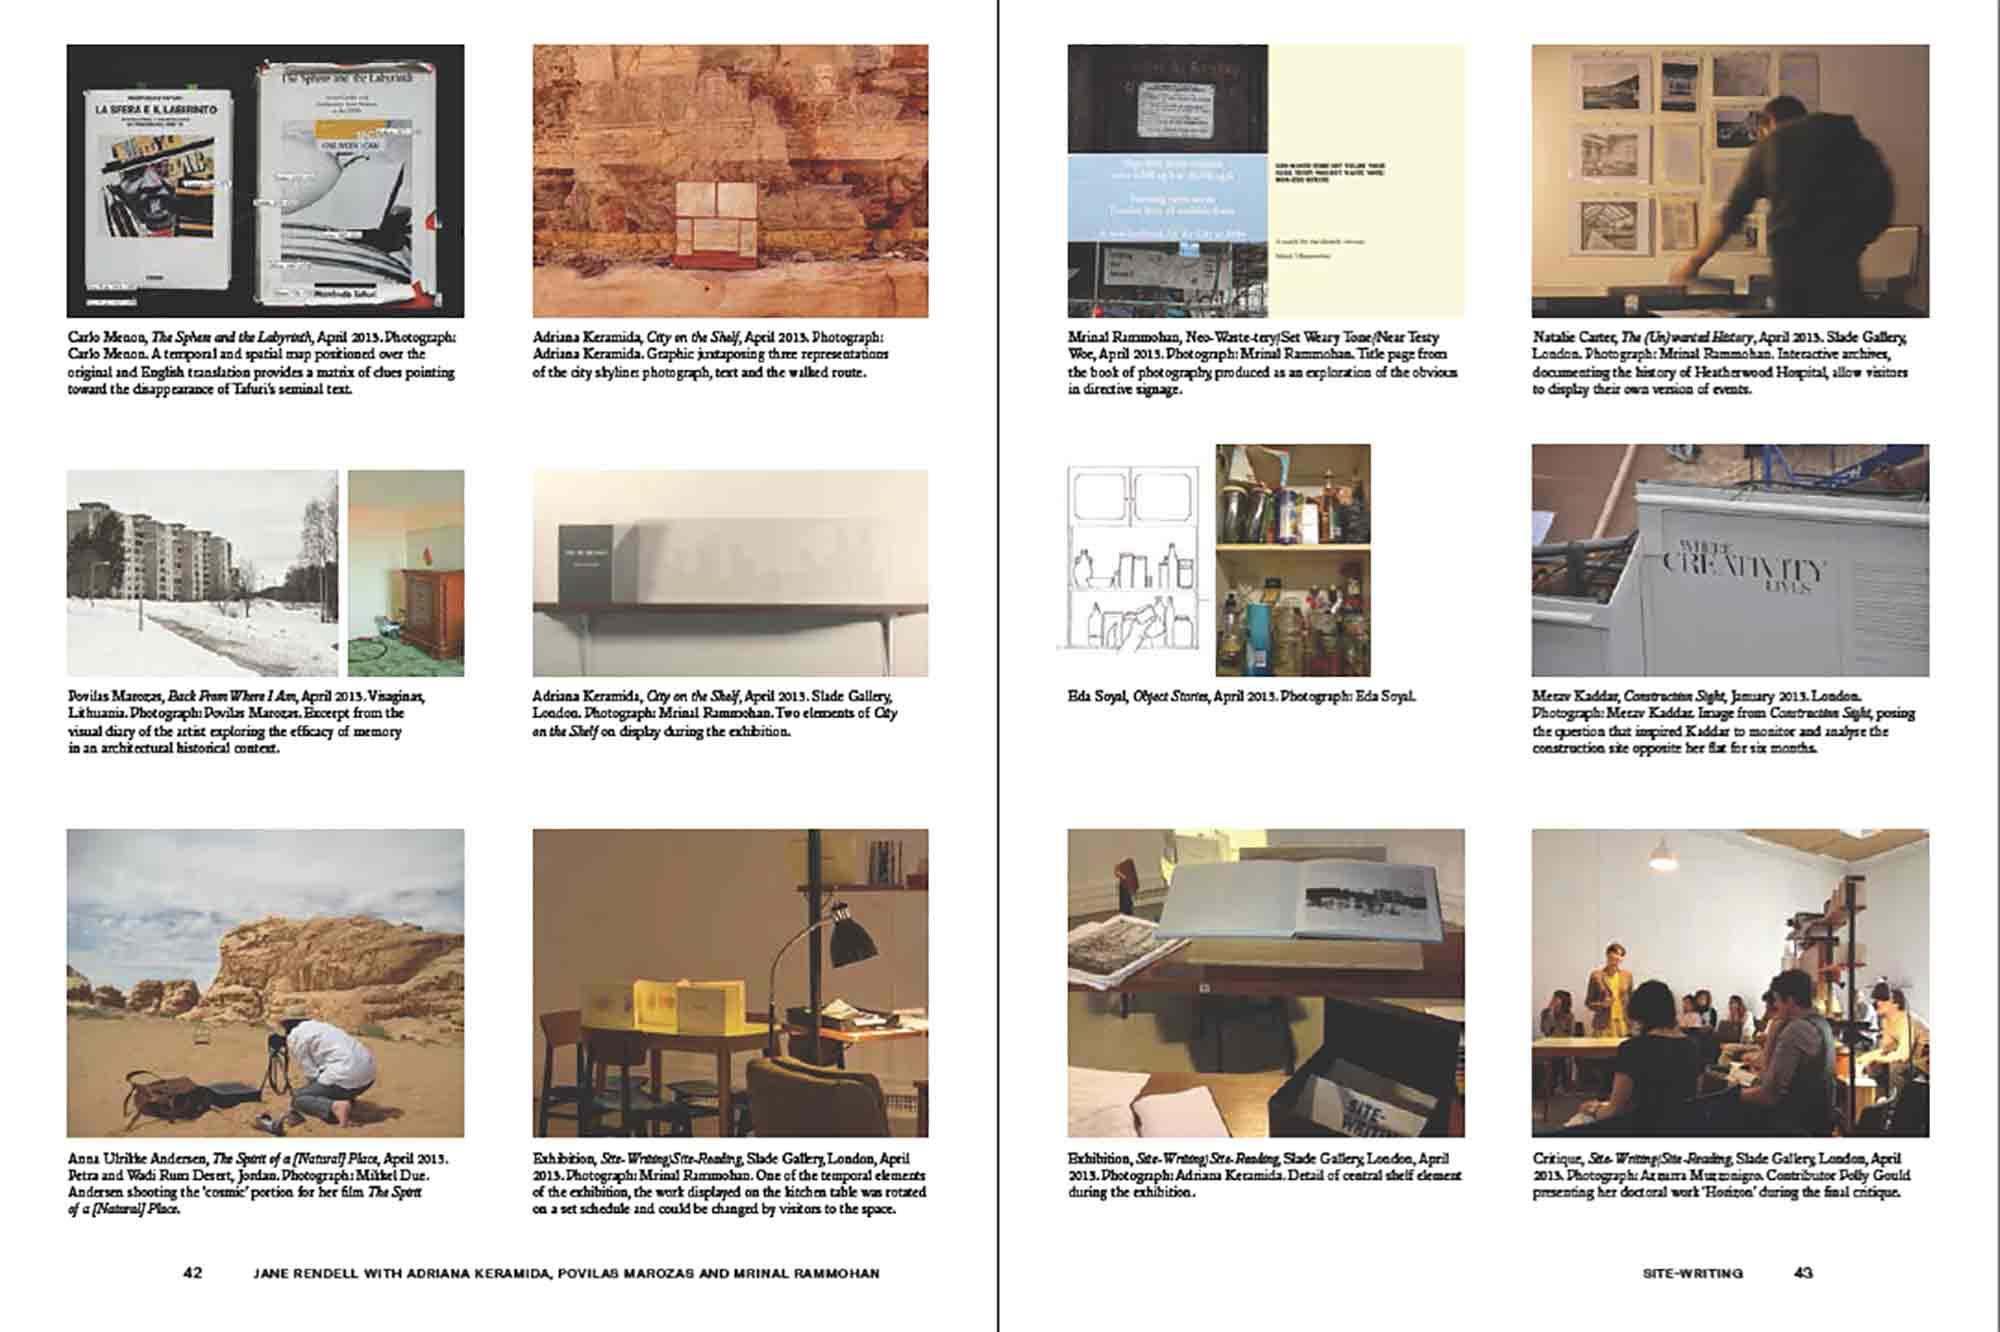 Site-Writing/Site Reading, Engaged Urbanism (42-43)